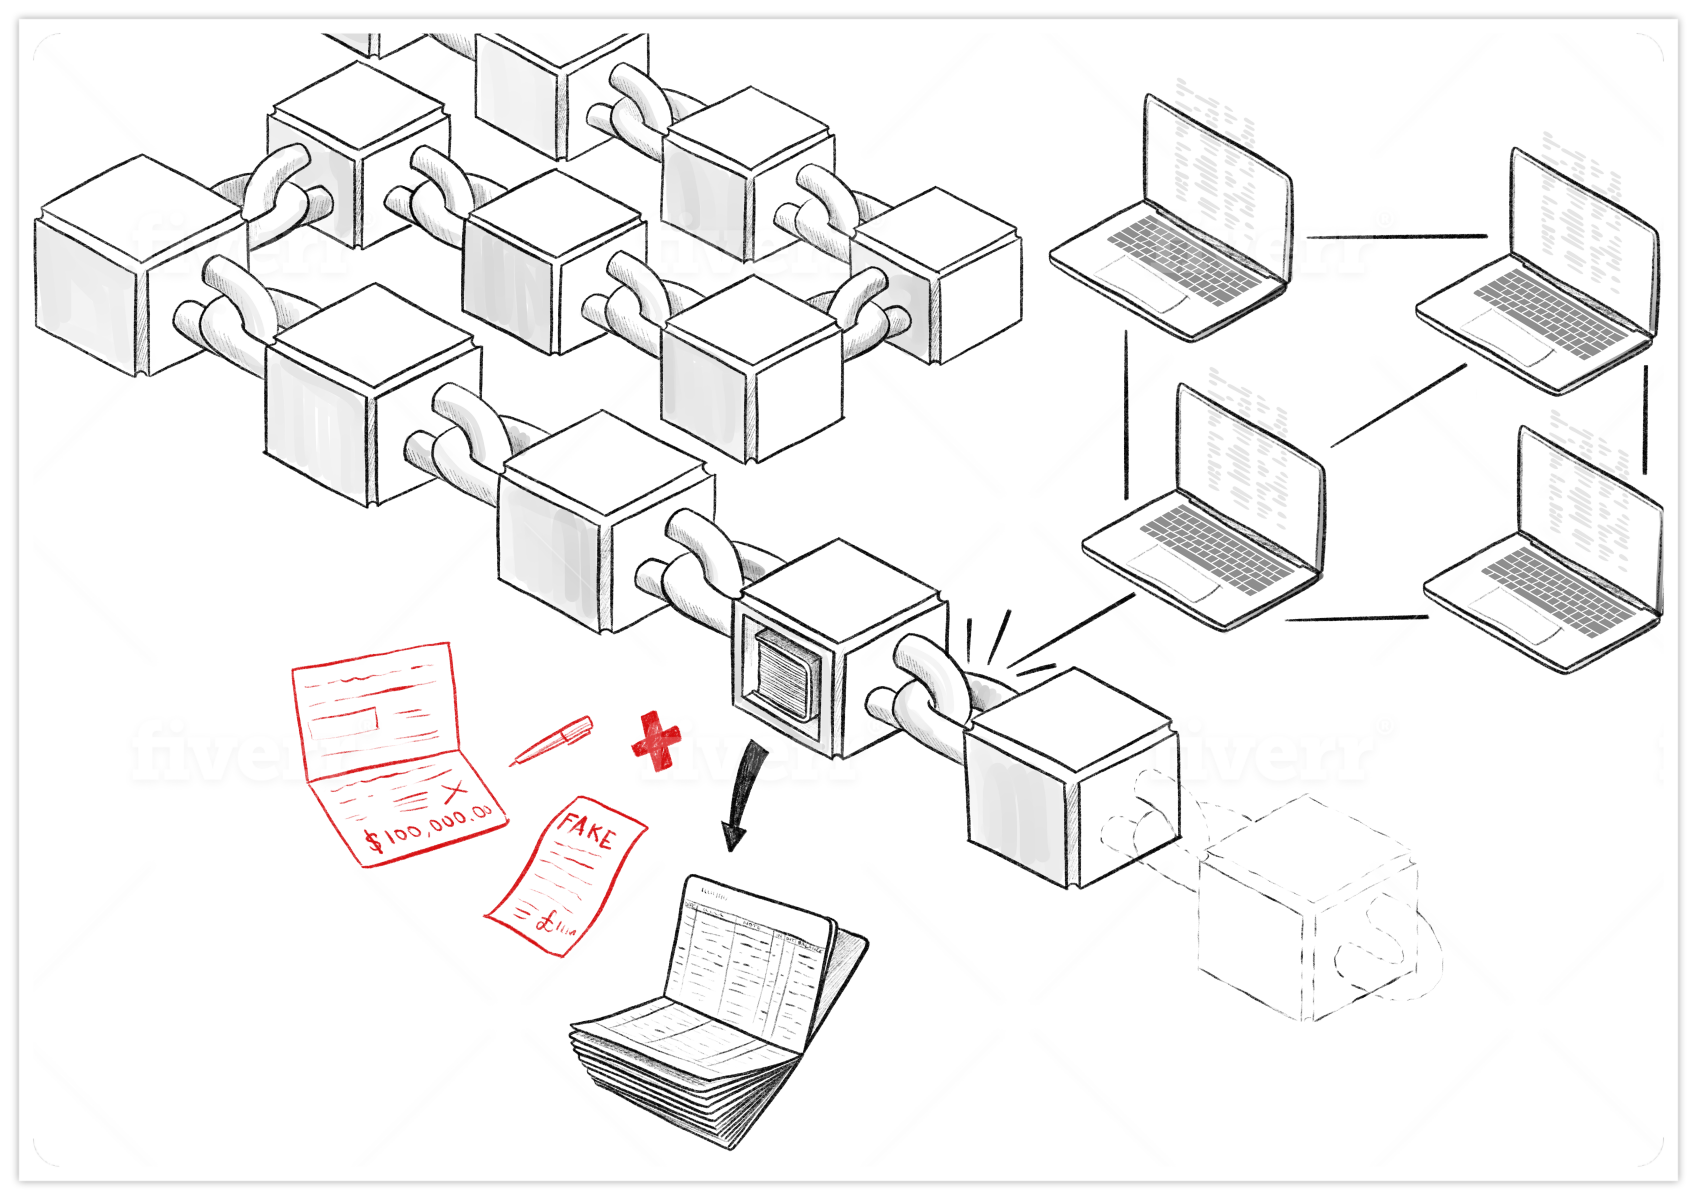 SEO 文章優化:以圖示方式搭配說明複雜的「區塊鏈」概念